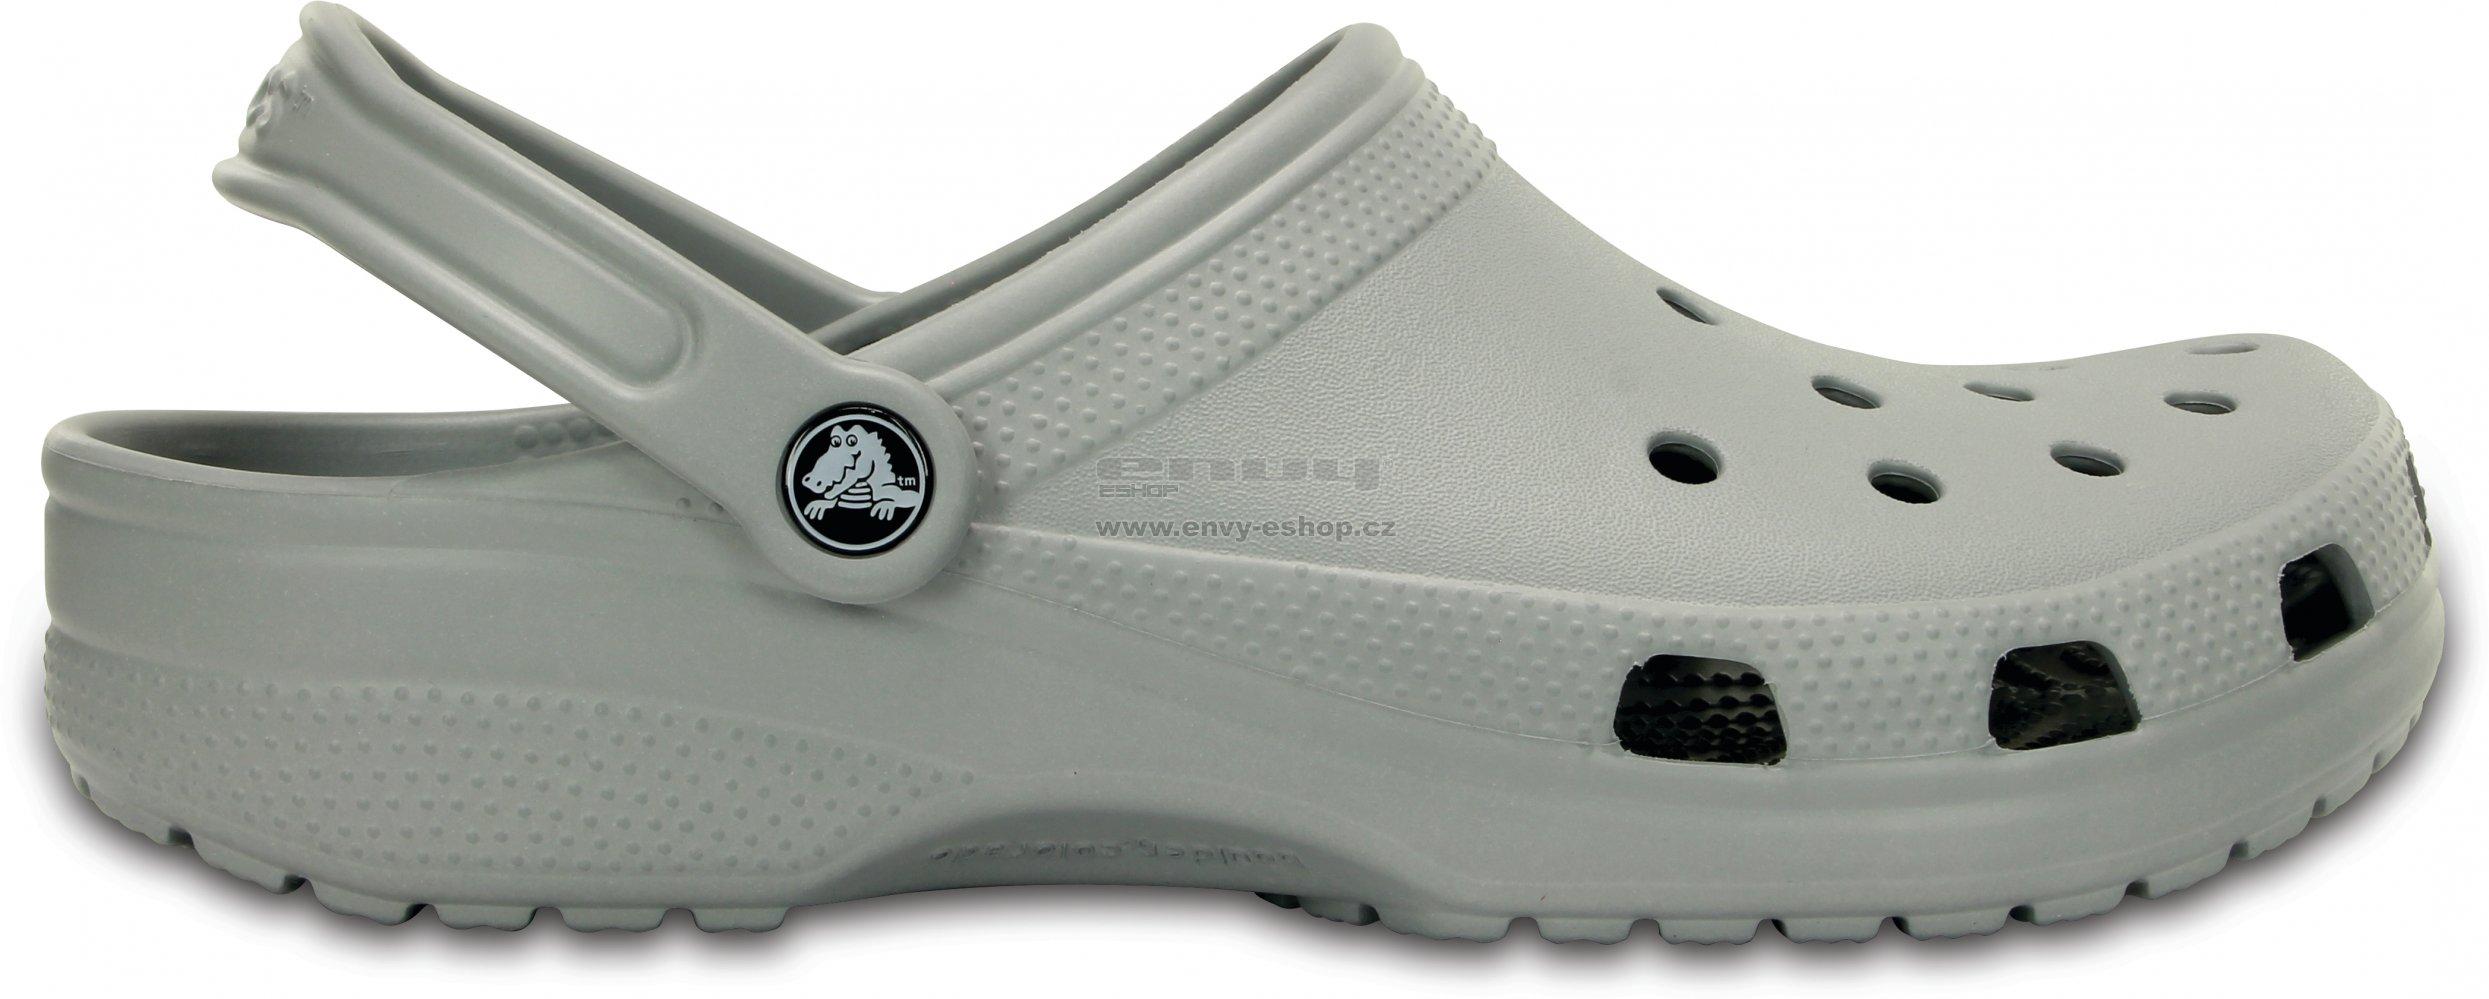 d6d28ccaa20 Dámské pantofle CROCS CLASSIC 10001-007 LIGHT GREY velikost  39-40 ...